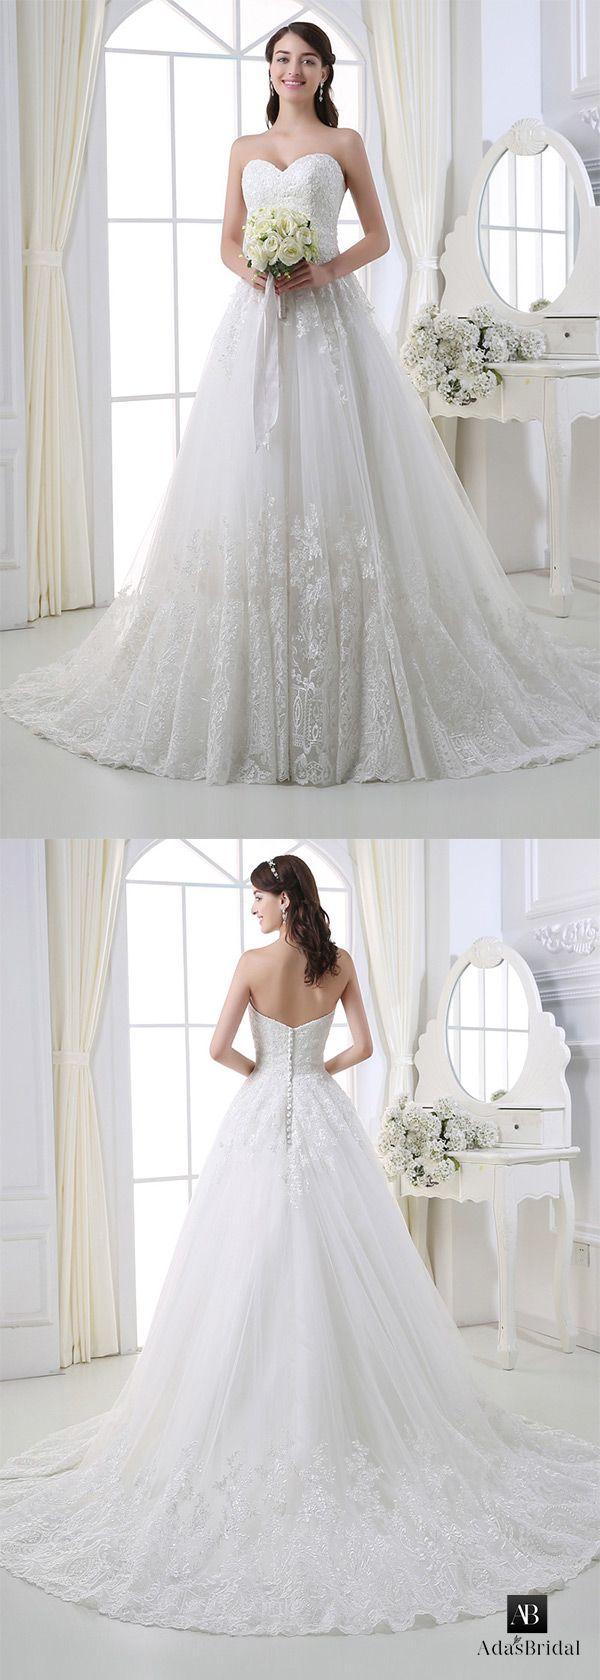 Sweetheart ball gown wedding dress  Elegant tulle sweetheart neckline ball gown wedding dress with lace